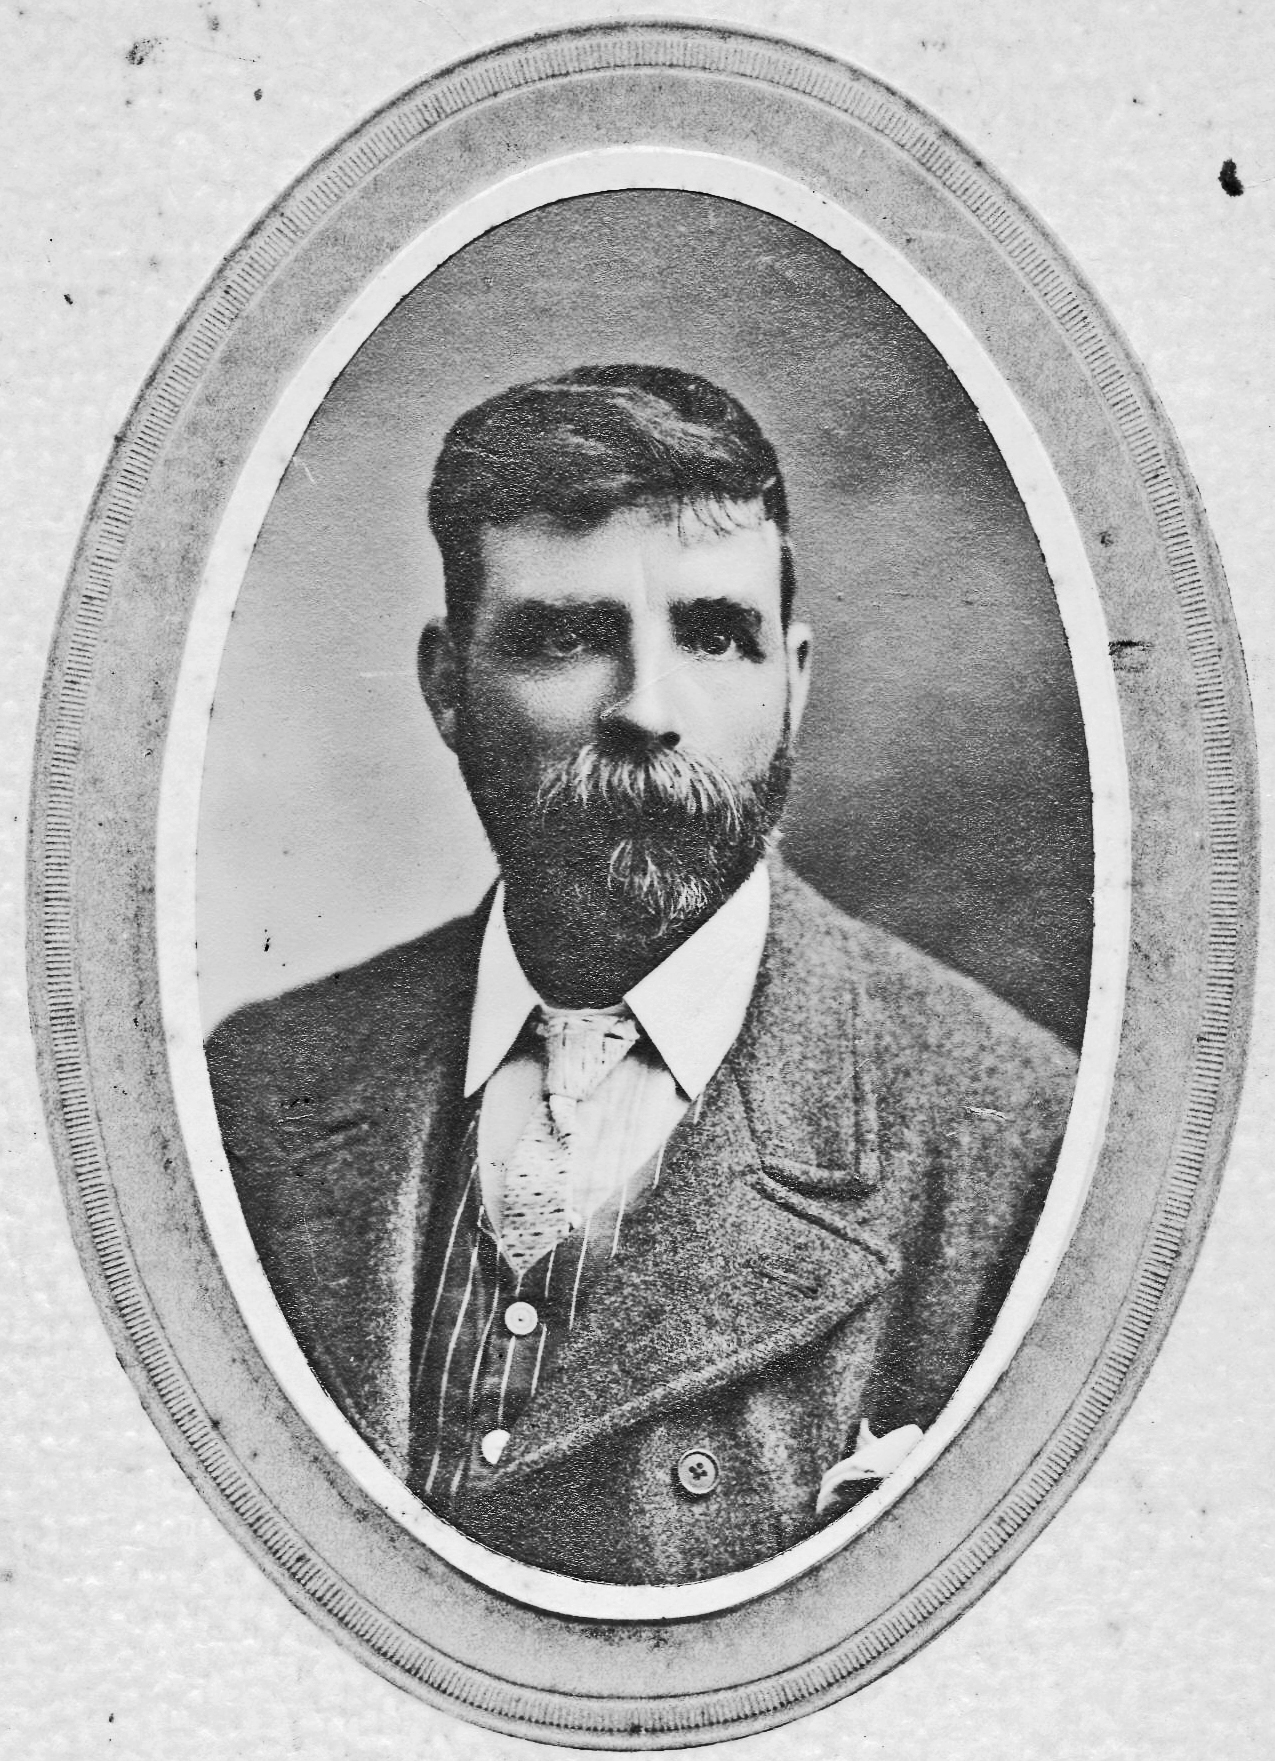 A younger Frank Davis